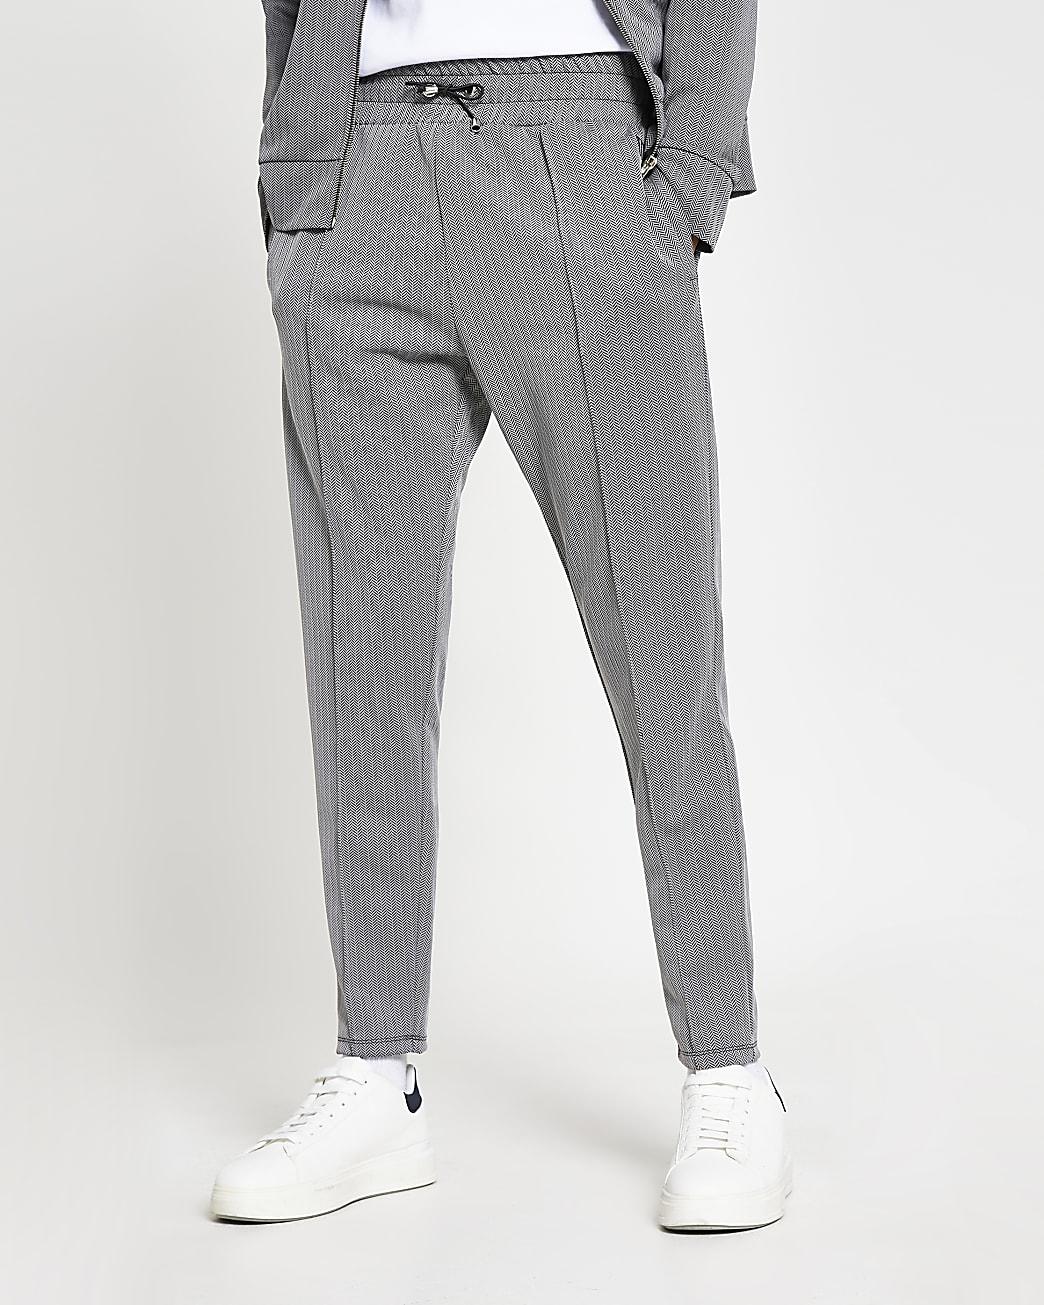 Masion Riviera grey slim fit joggers